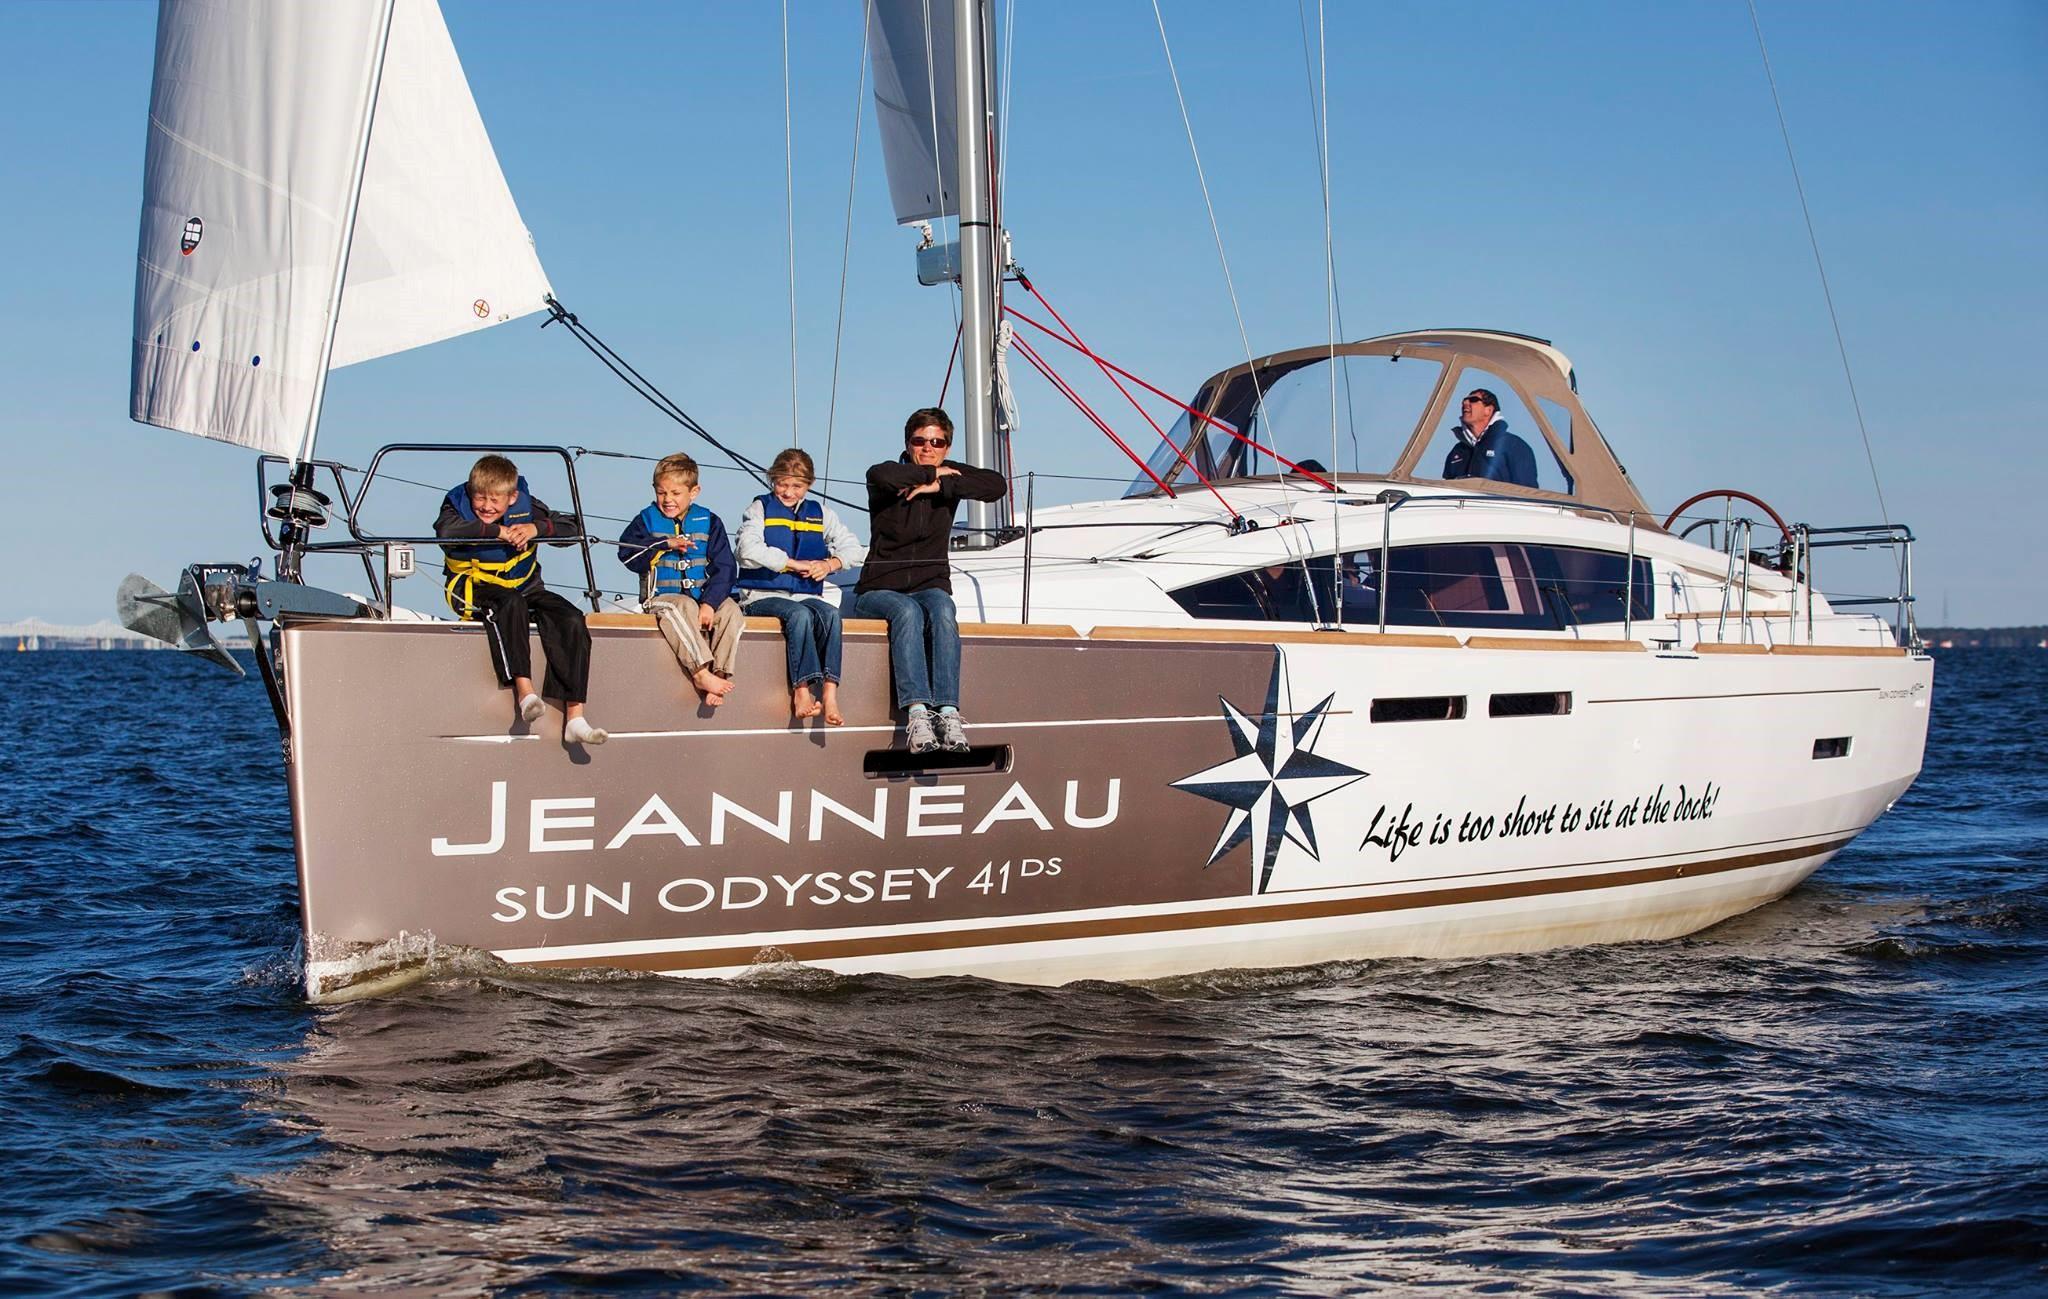 jeanneau family boating